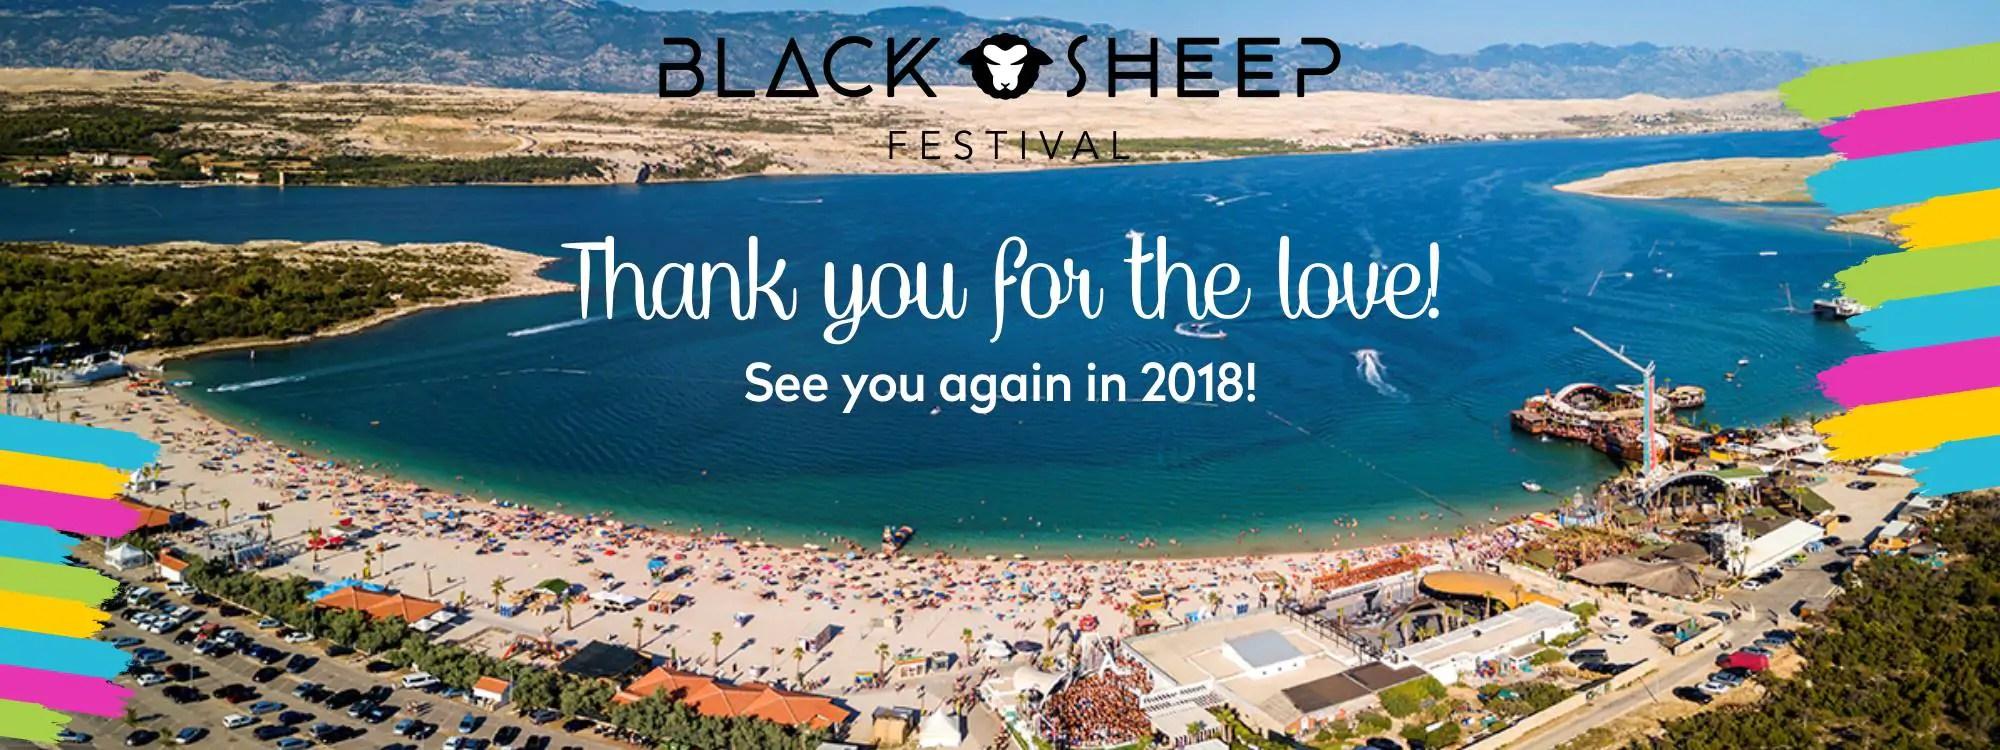 Black sheep Festival 2018, Pag Croazia – Date – Lineup – Ticket – Appartamenti